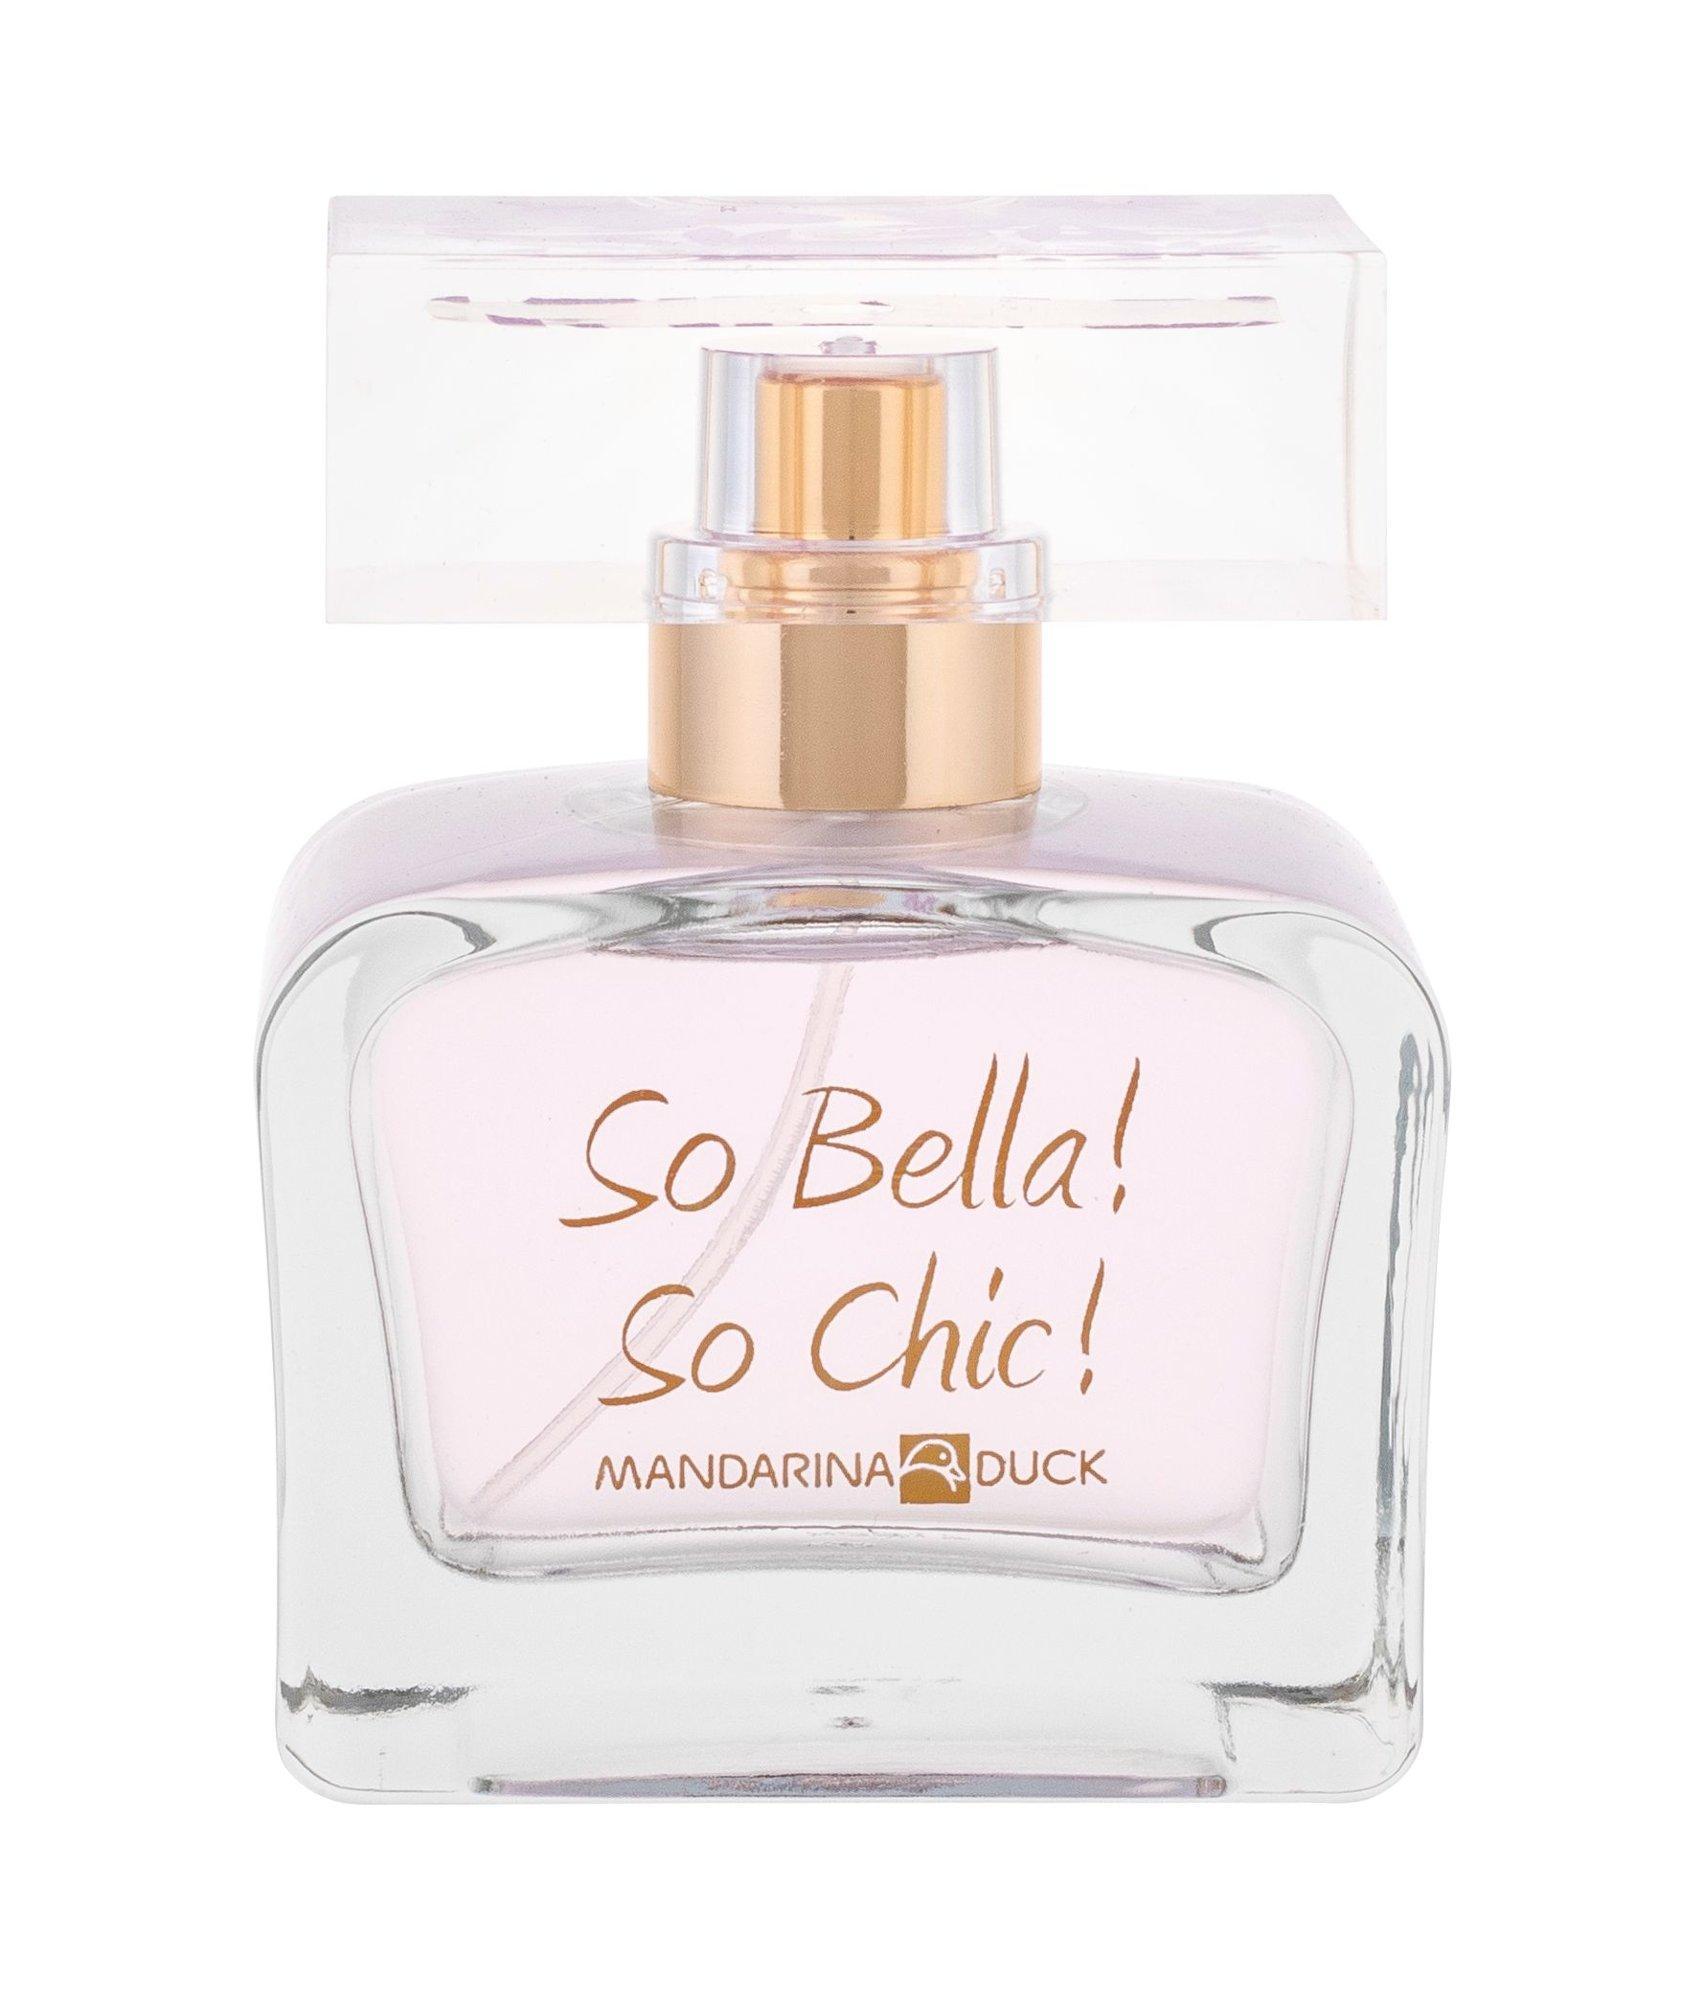 Mandarina Duck So Bella! So Chic! Eau de Toilette 50ml